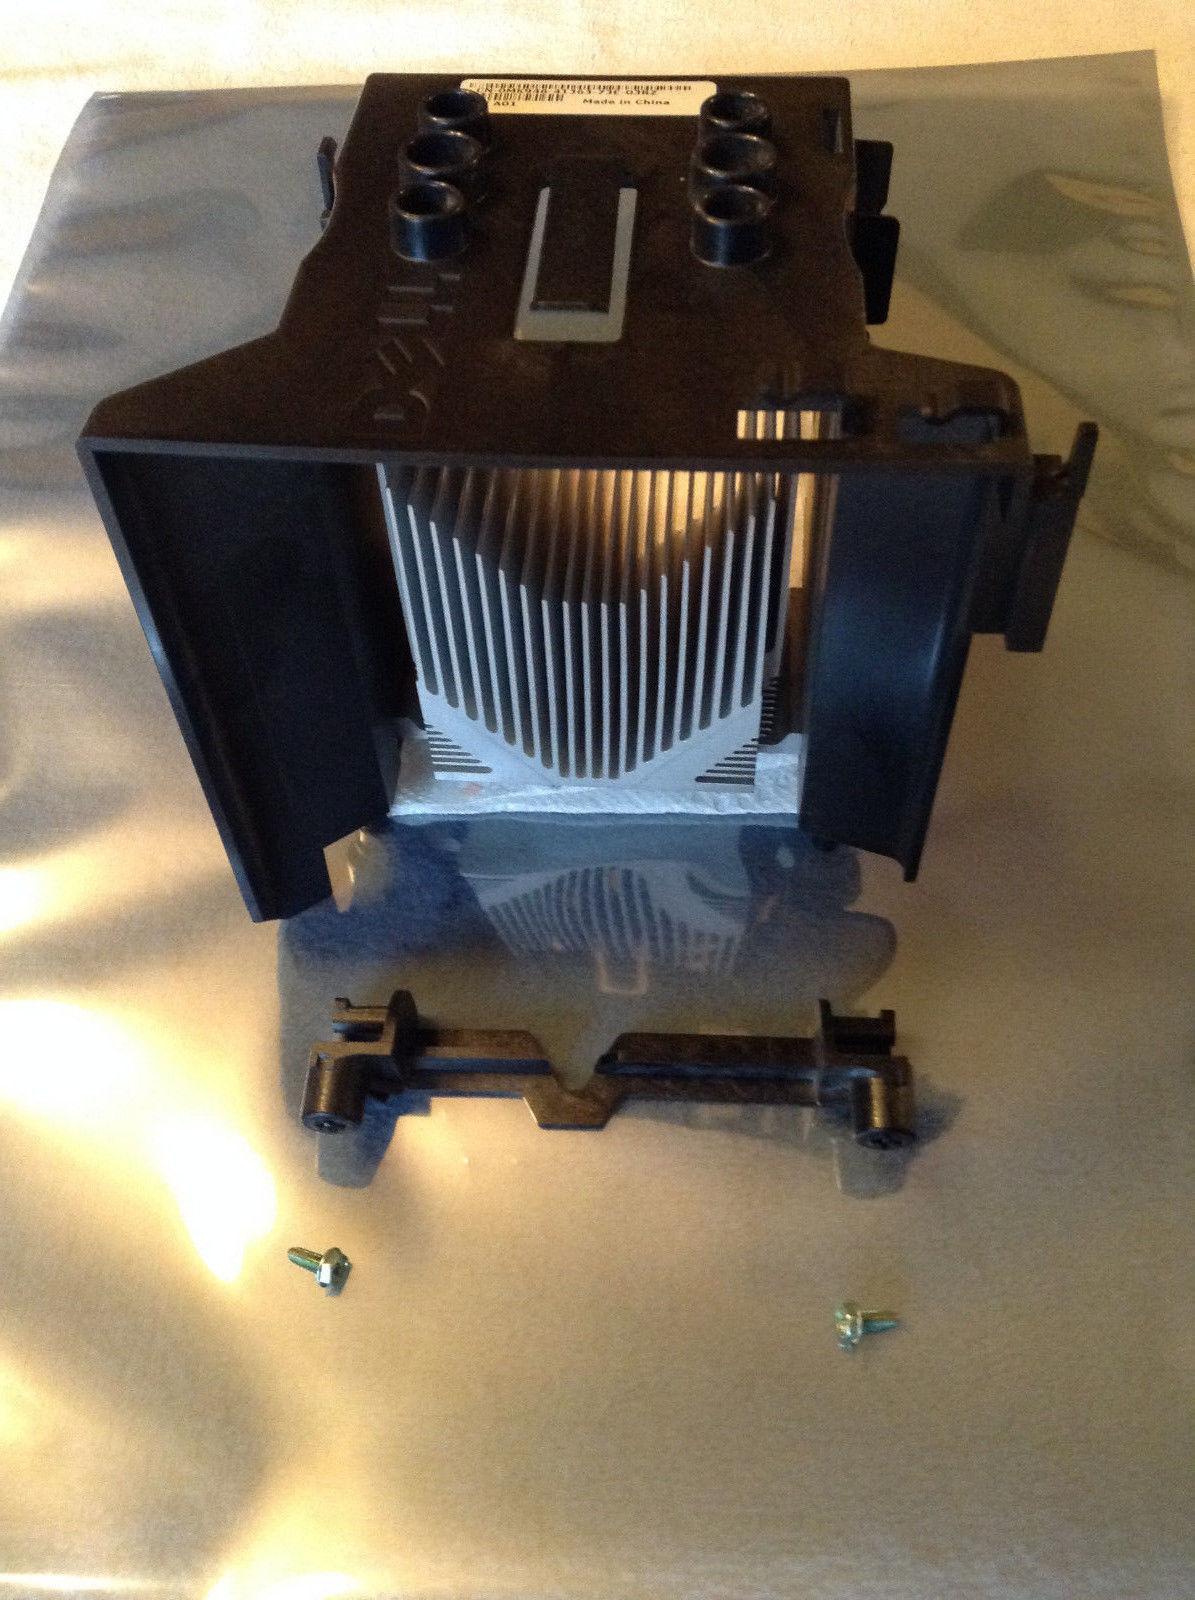 Dell Optiplex - Dimension Heatsink & Shroud and 50 similar items